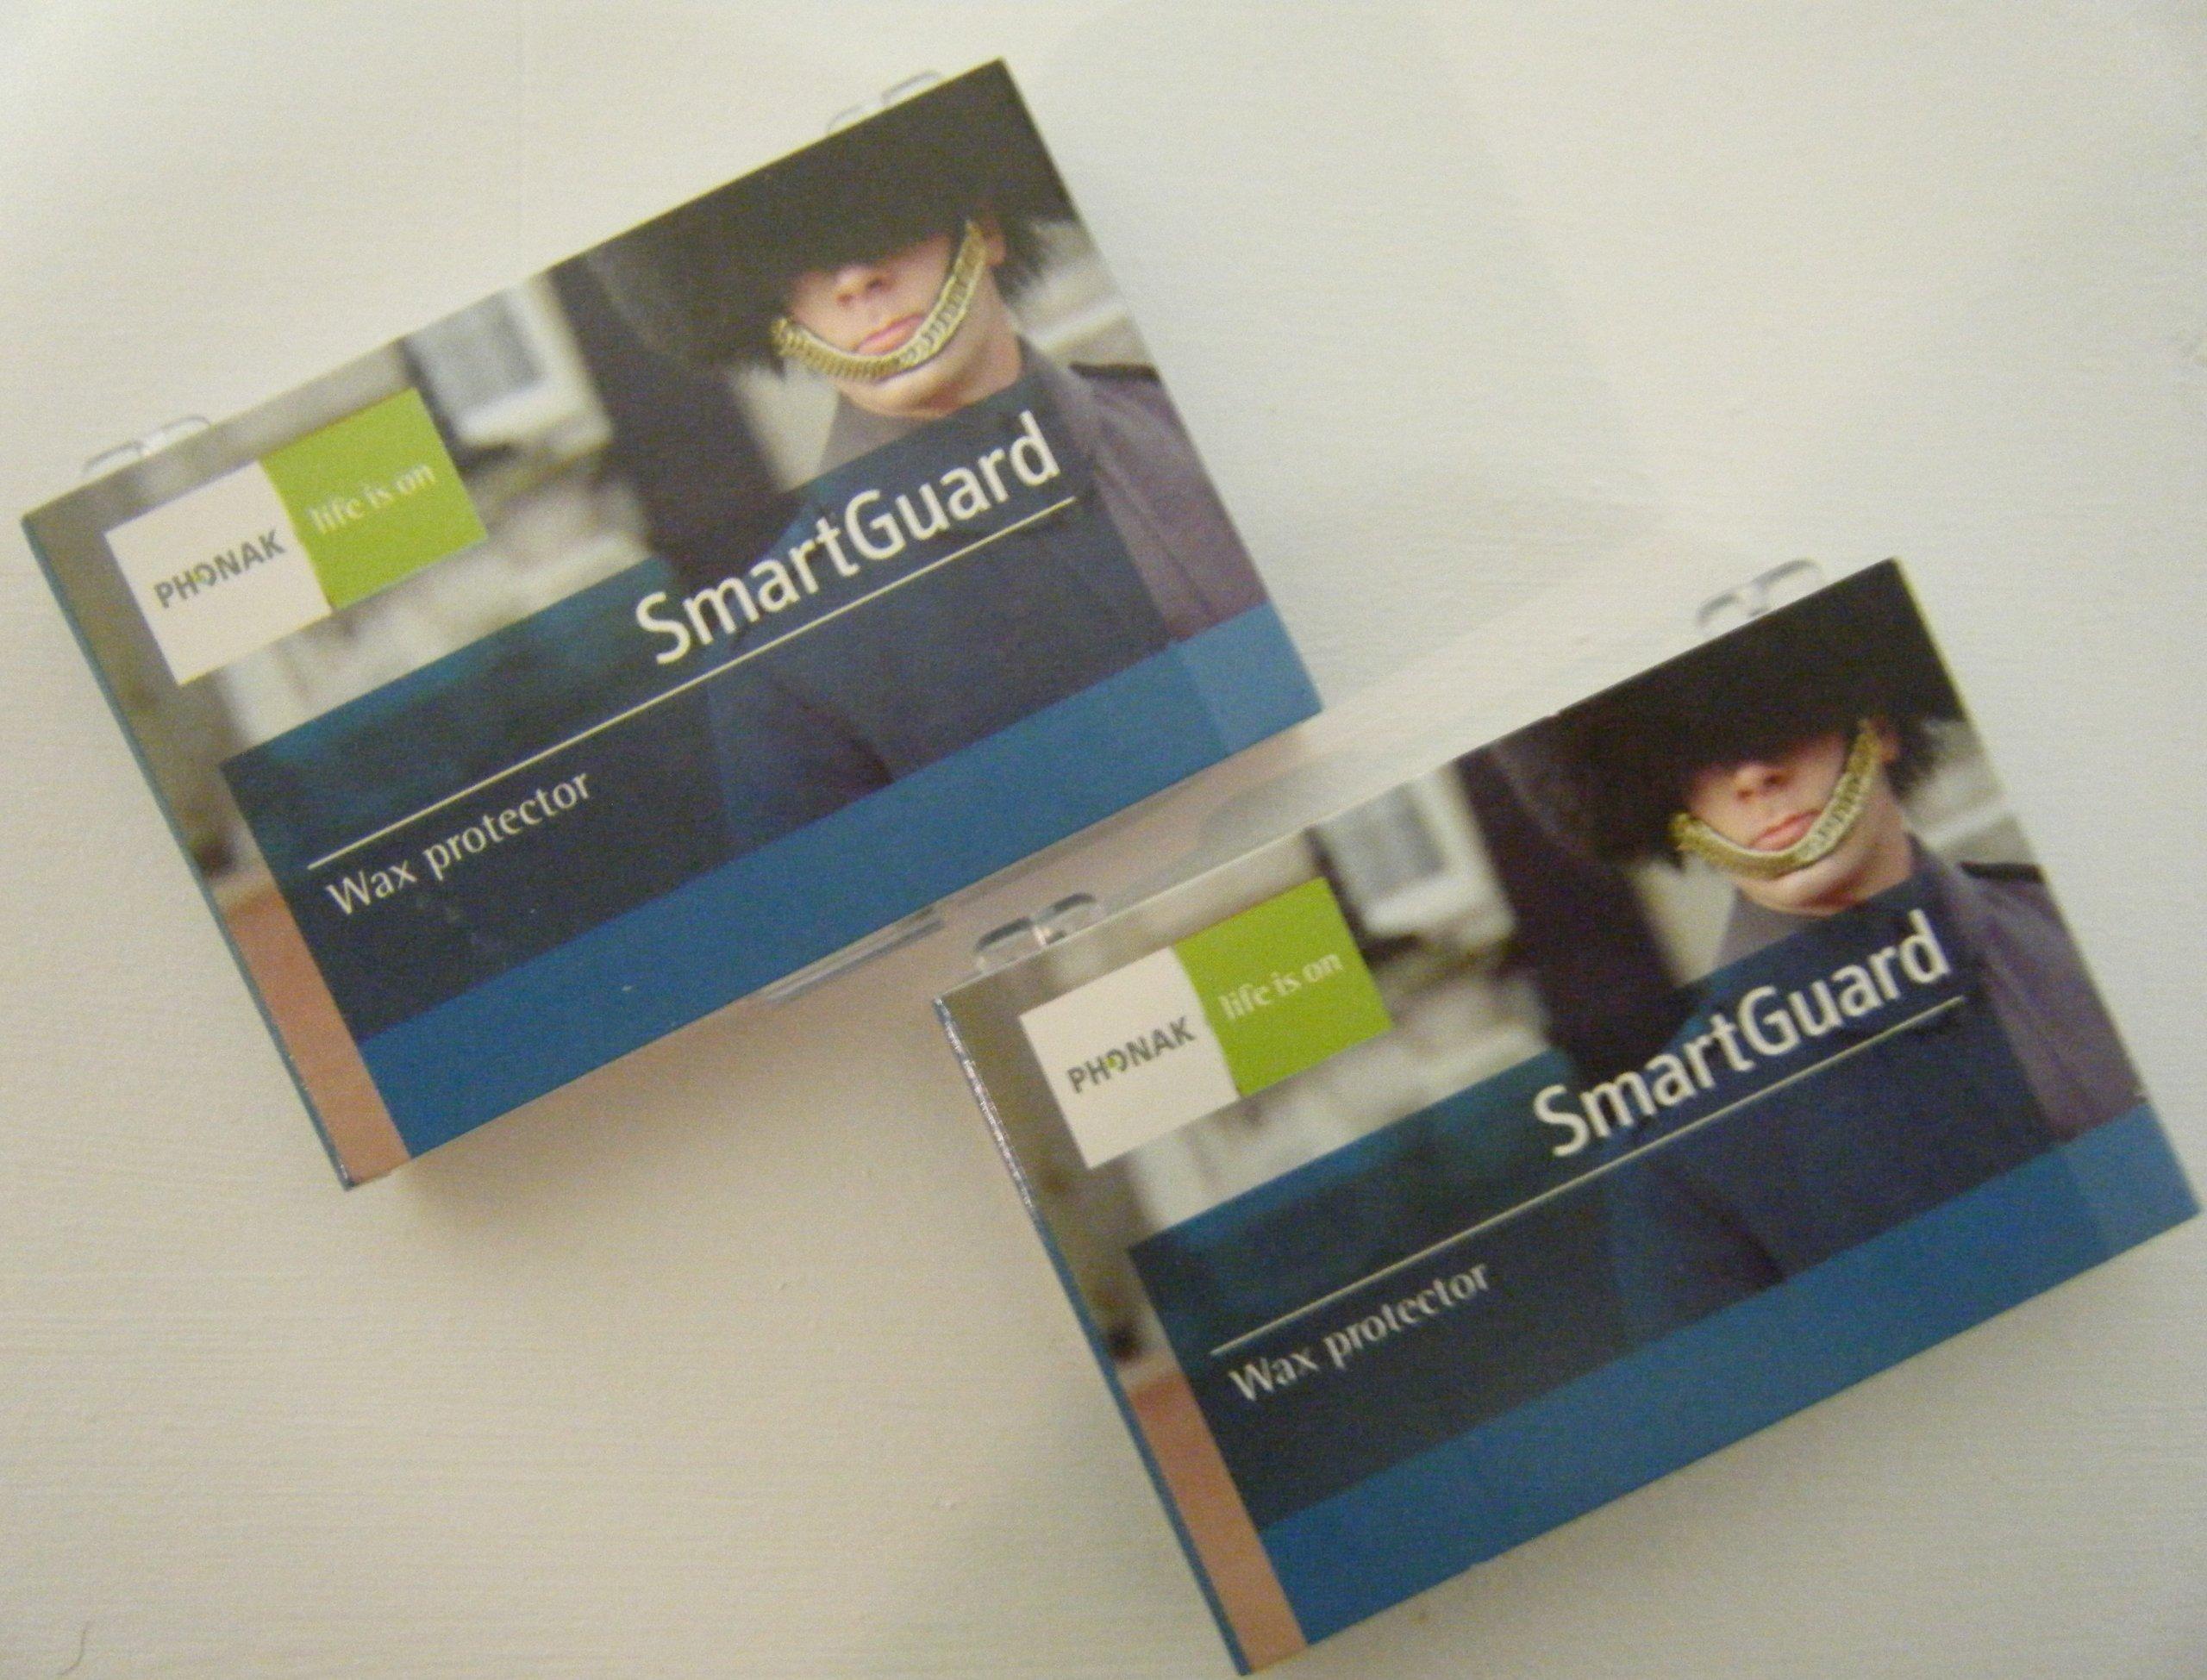 (2 Packs) Phonak SmartGuard Wax Protector by Phonak